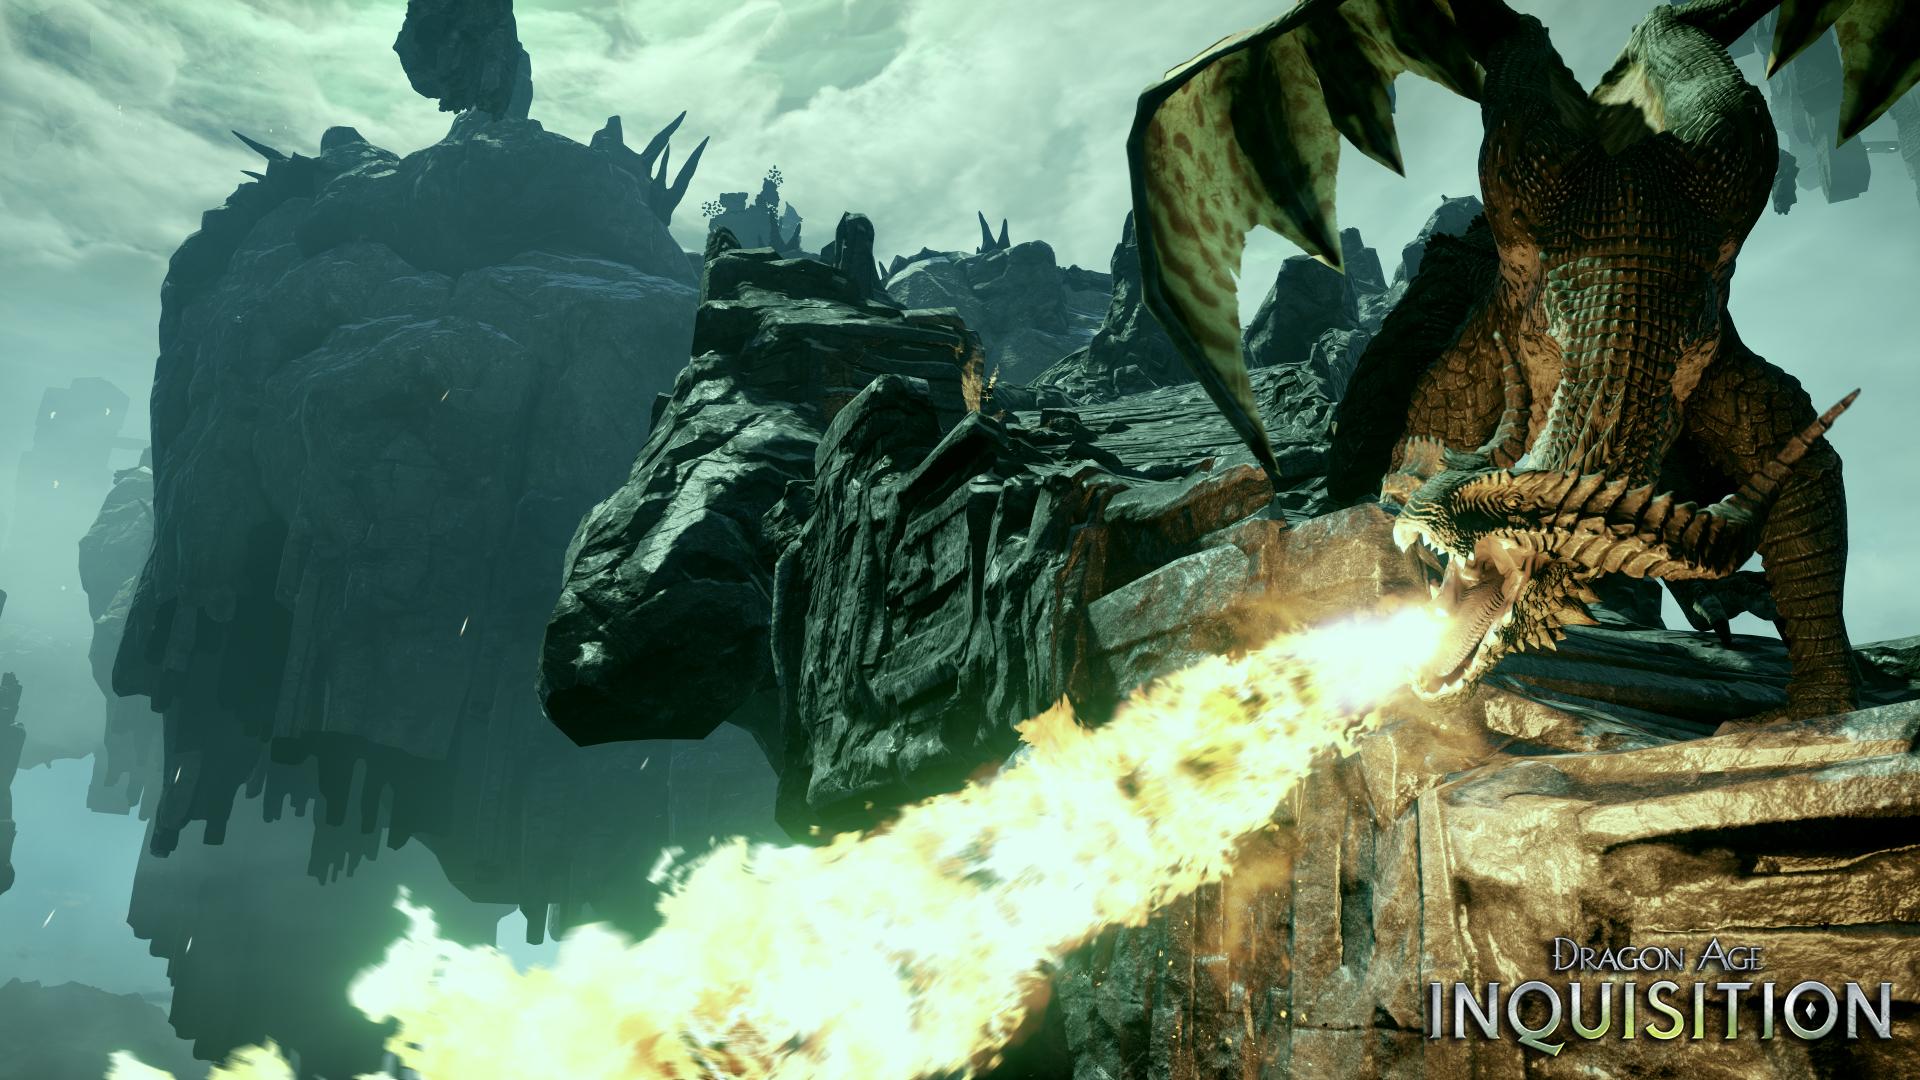 Dragon Age 3 Inquisition  № 1901397 бесплатно